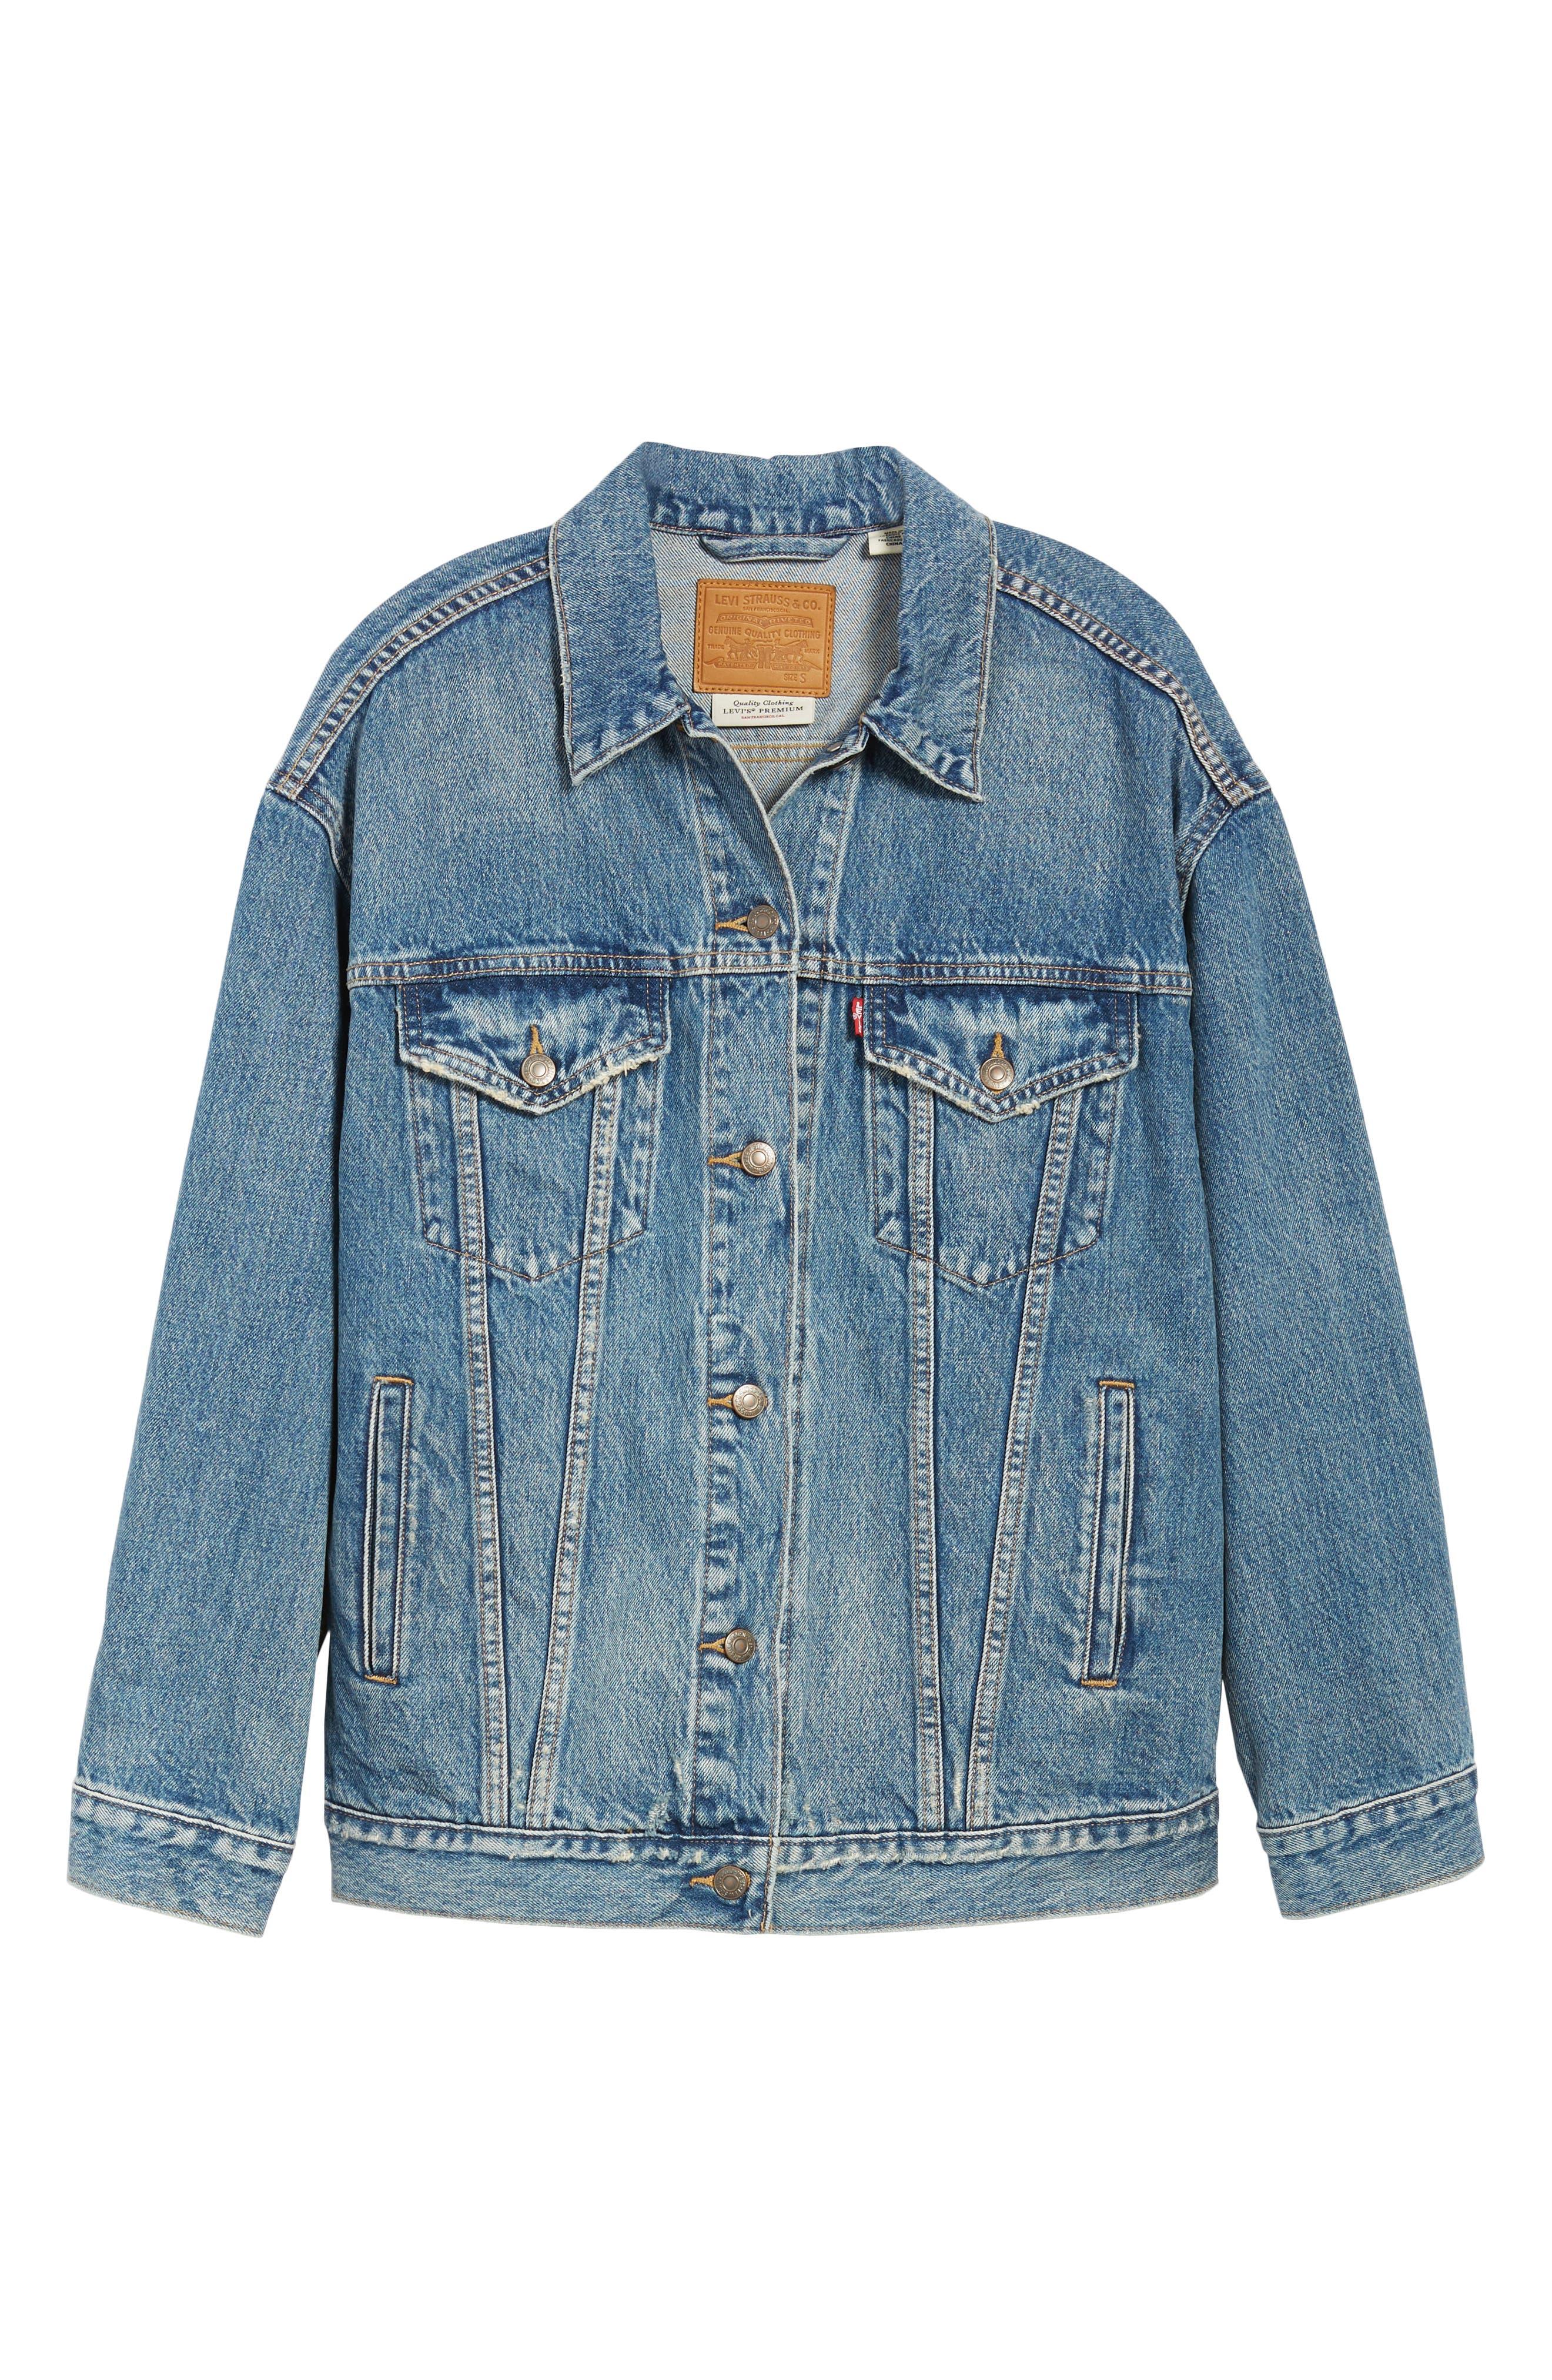 8a6e904debcc Levi s Jeans   Clothing